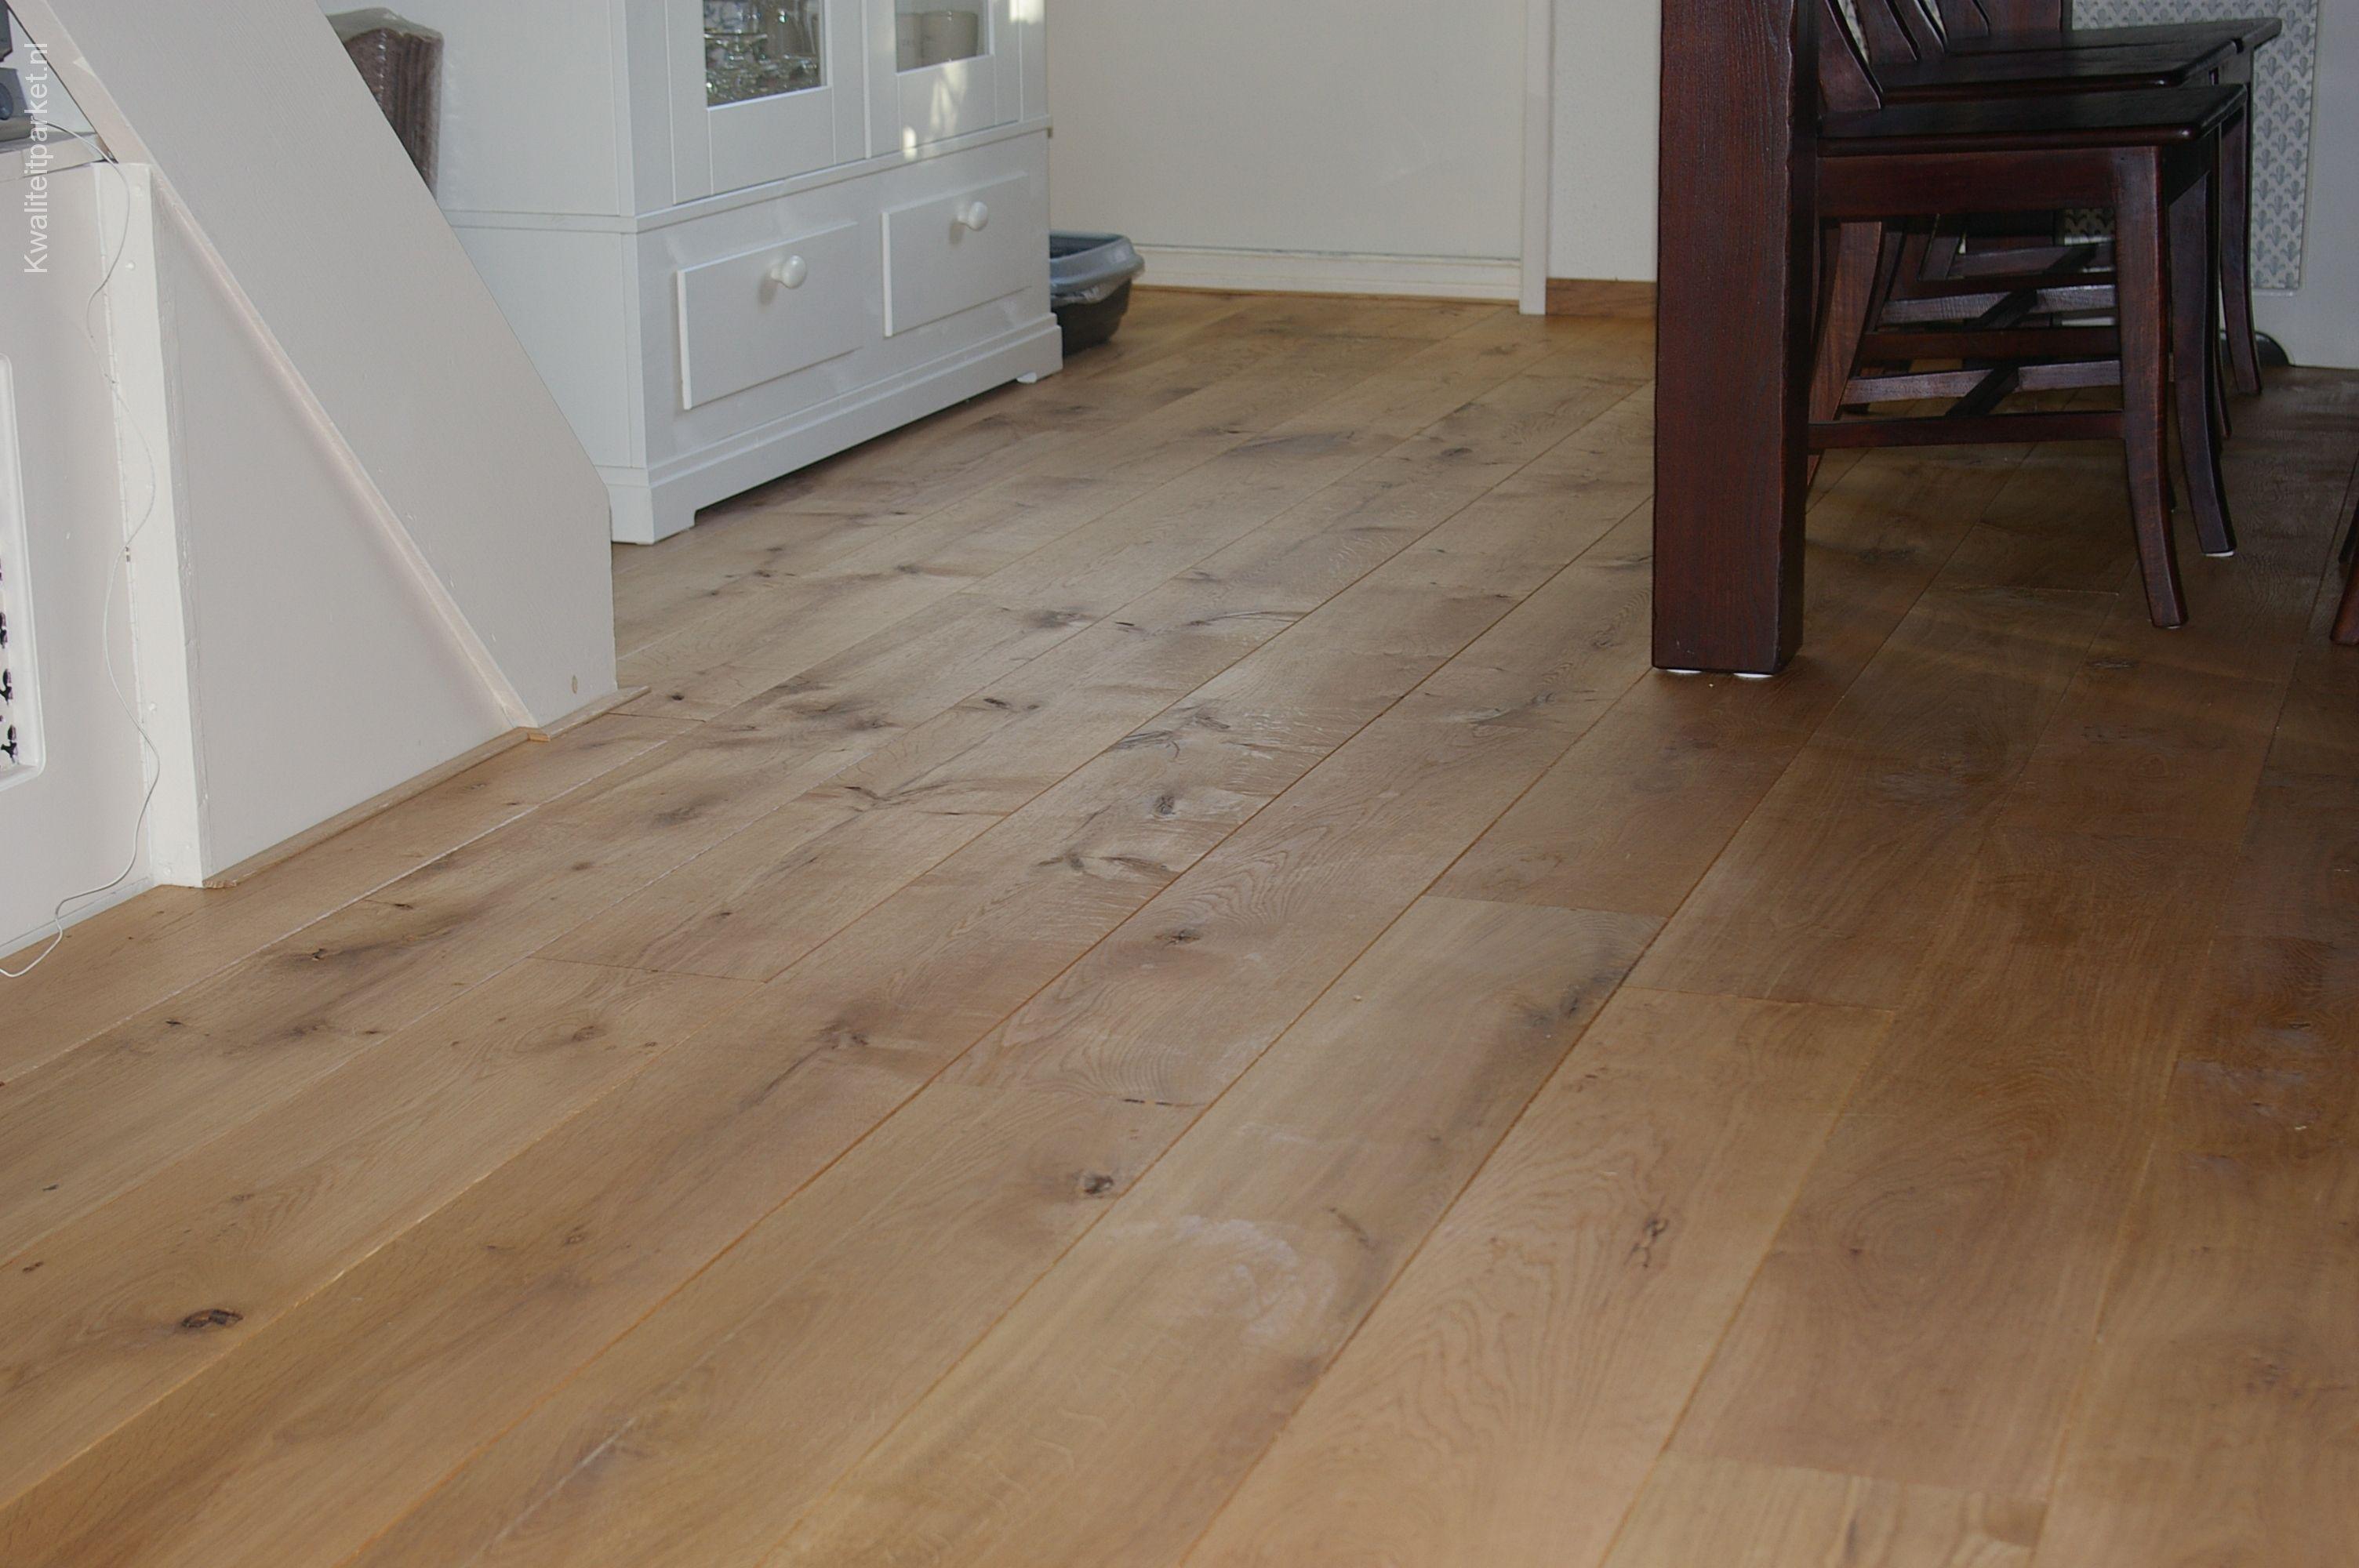 Restpartij Vinyl Vloer : Restpartij houten vloer m eiken rustiek a b cm mm top